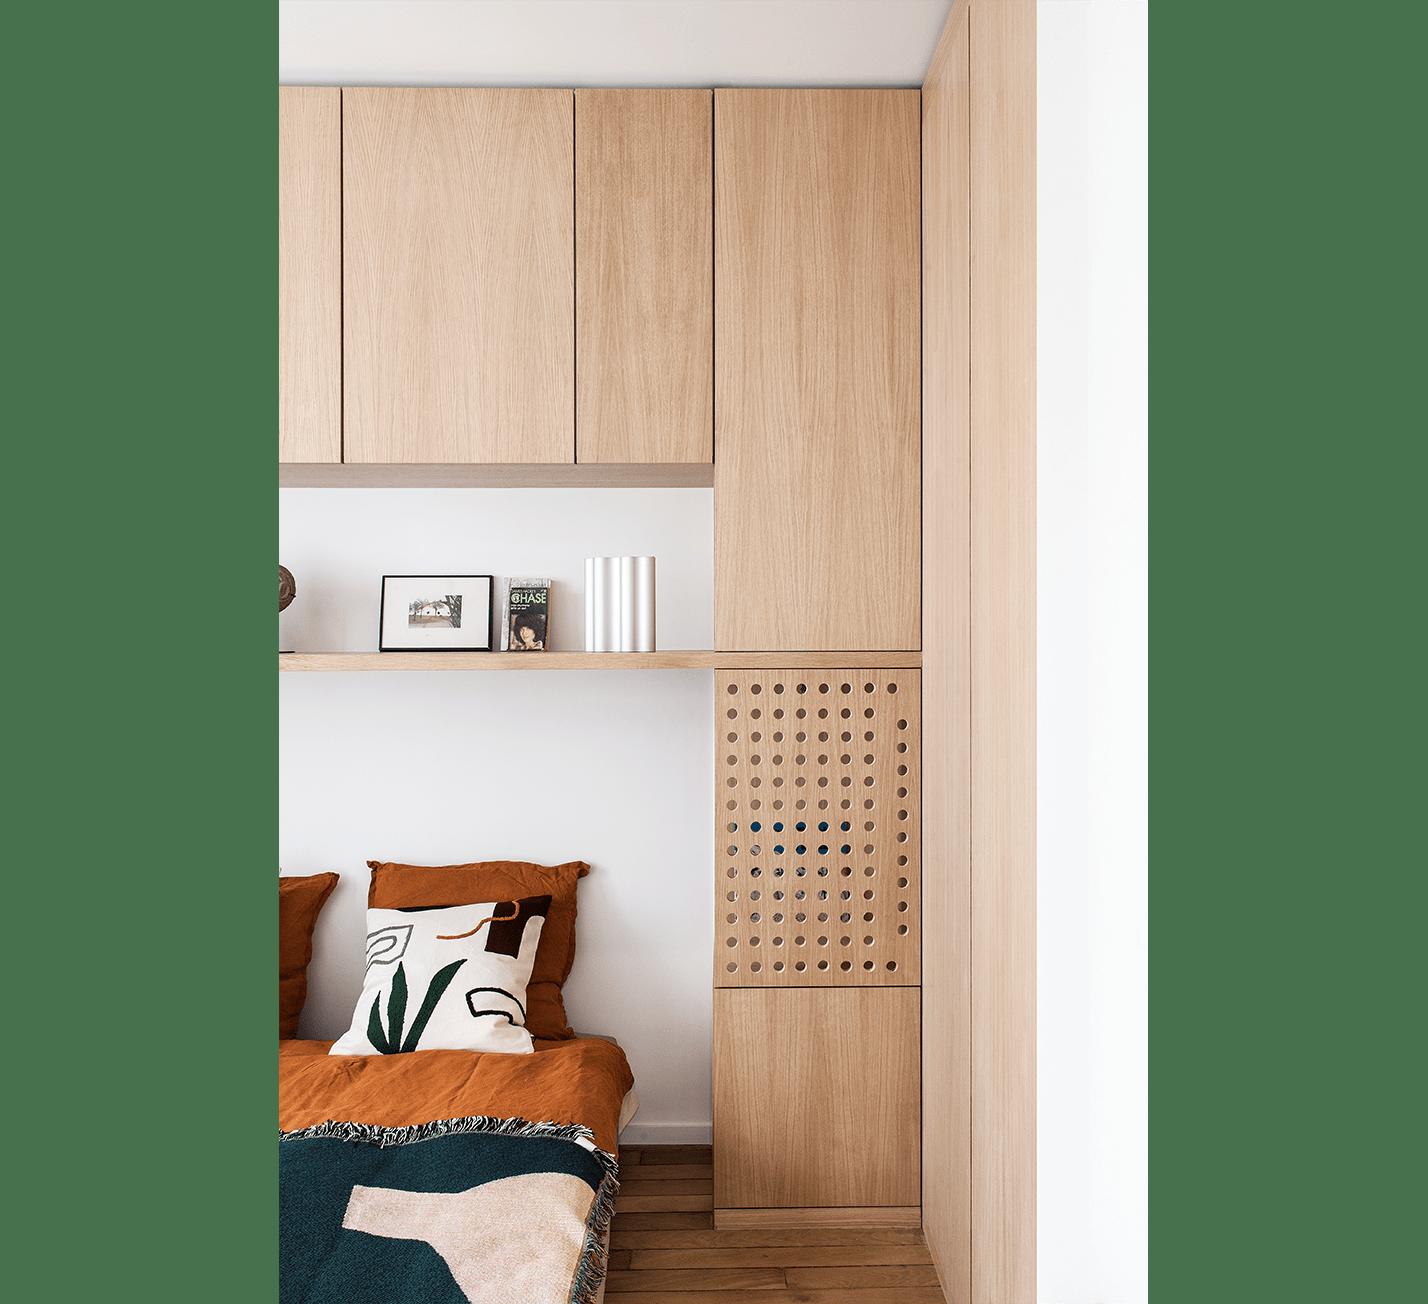 Projet-Cavallotti-Atelier-Steve-Pauline-Borgia-Architecte-interieur-07-min